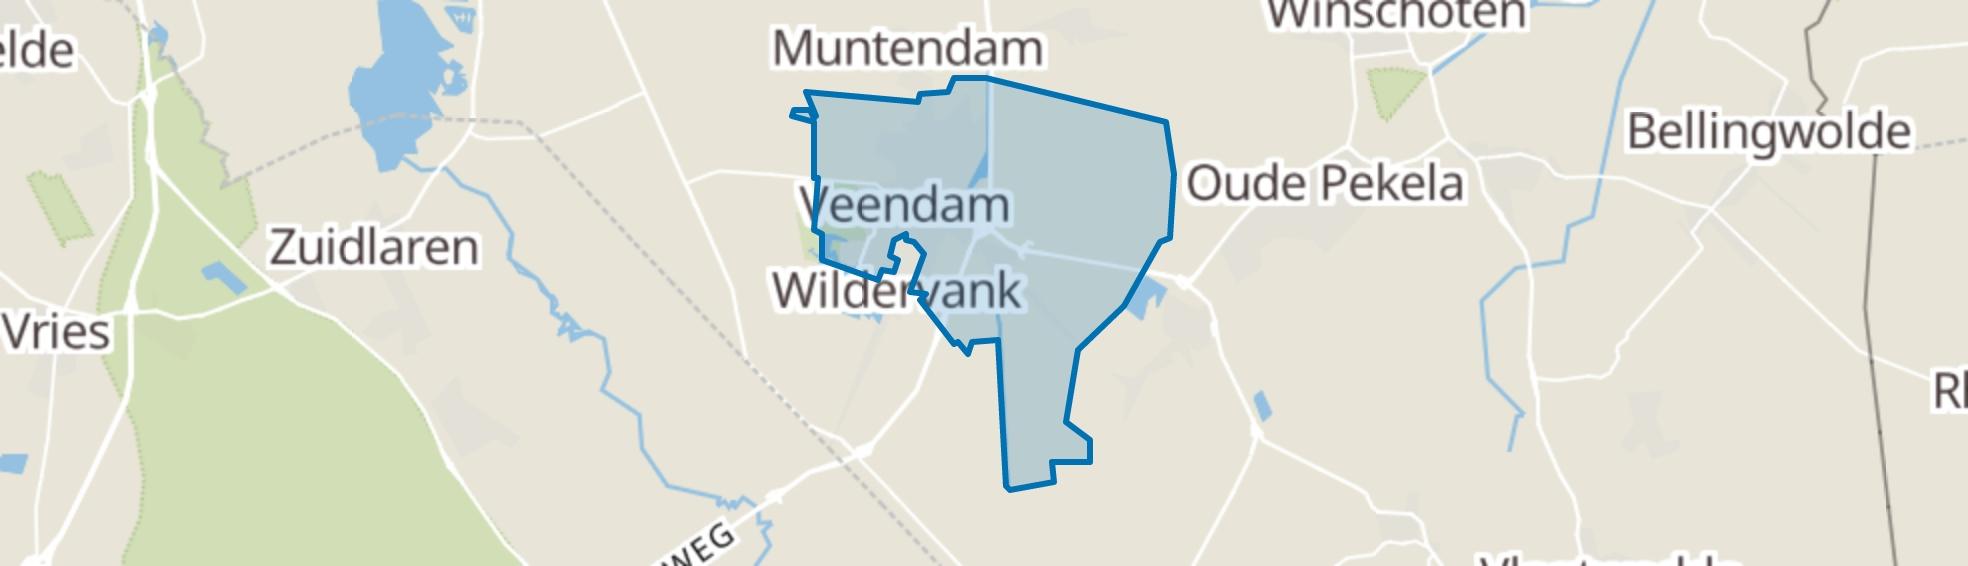 Veendam map